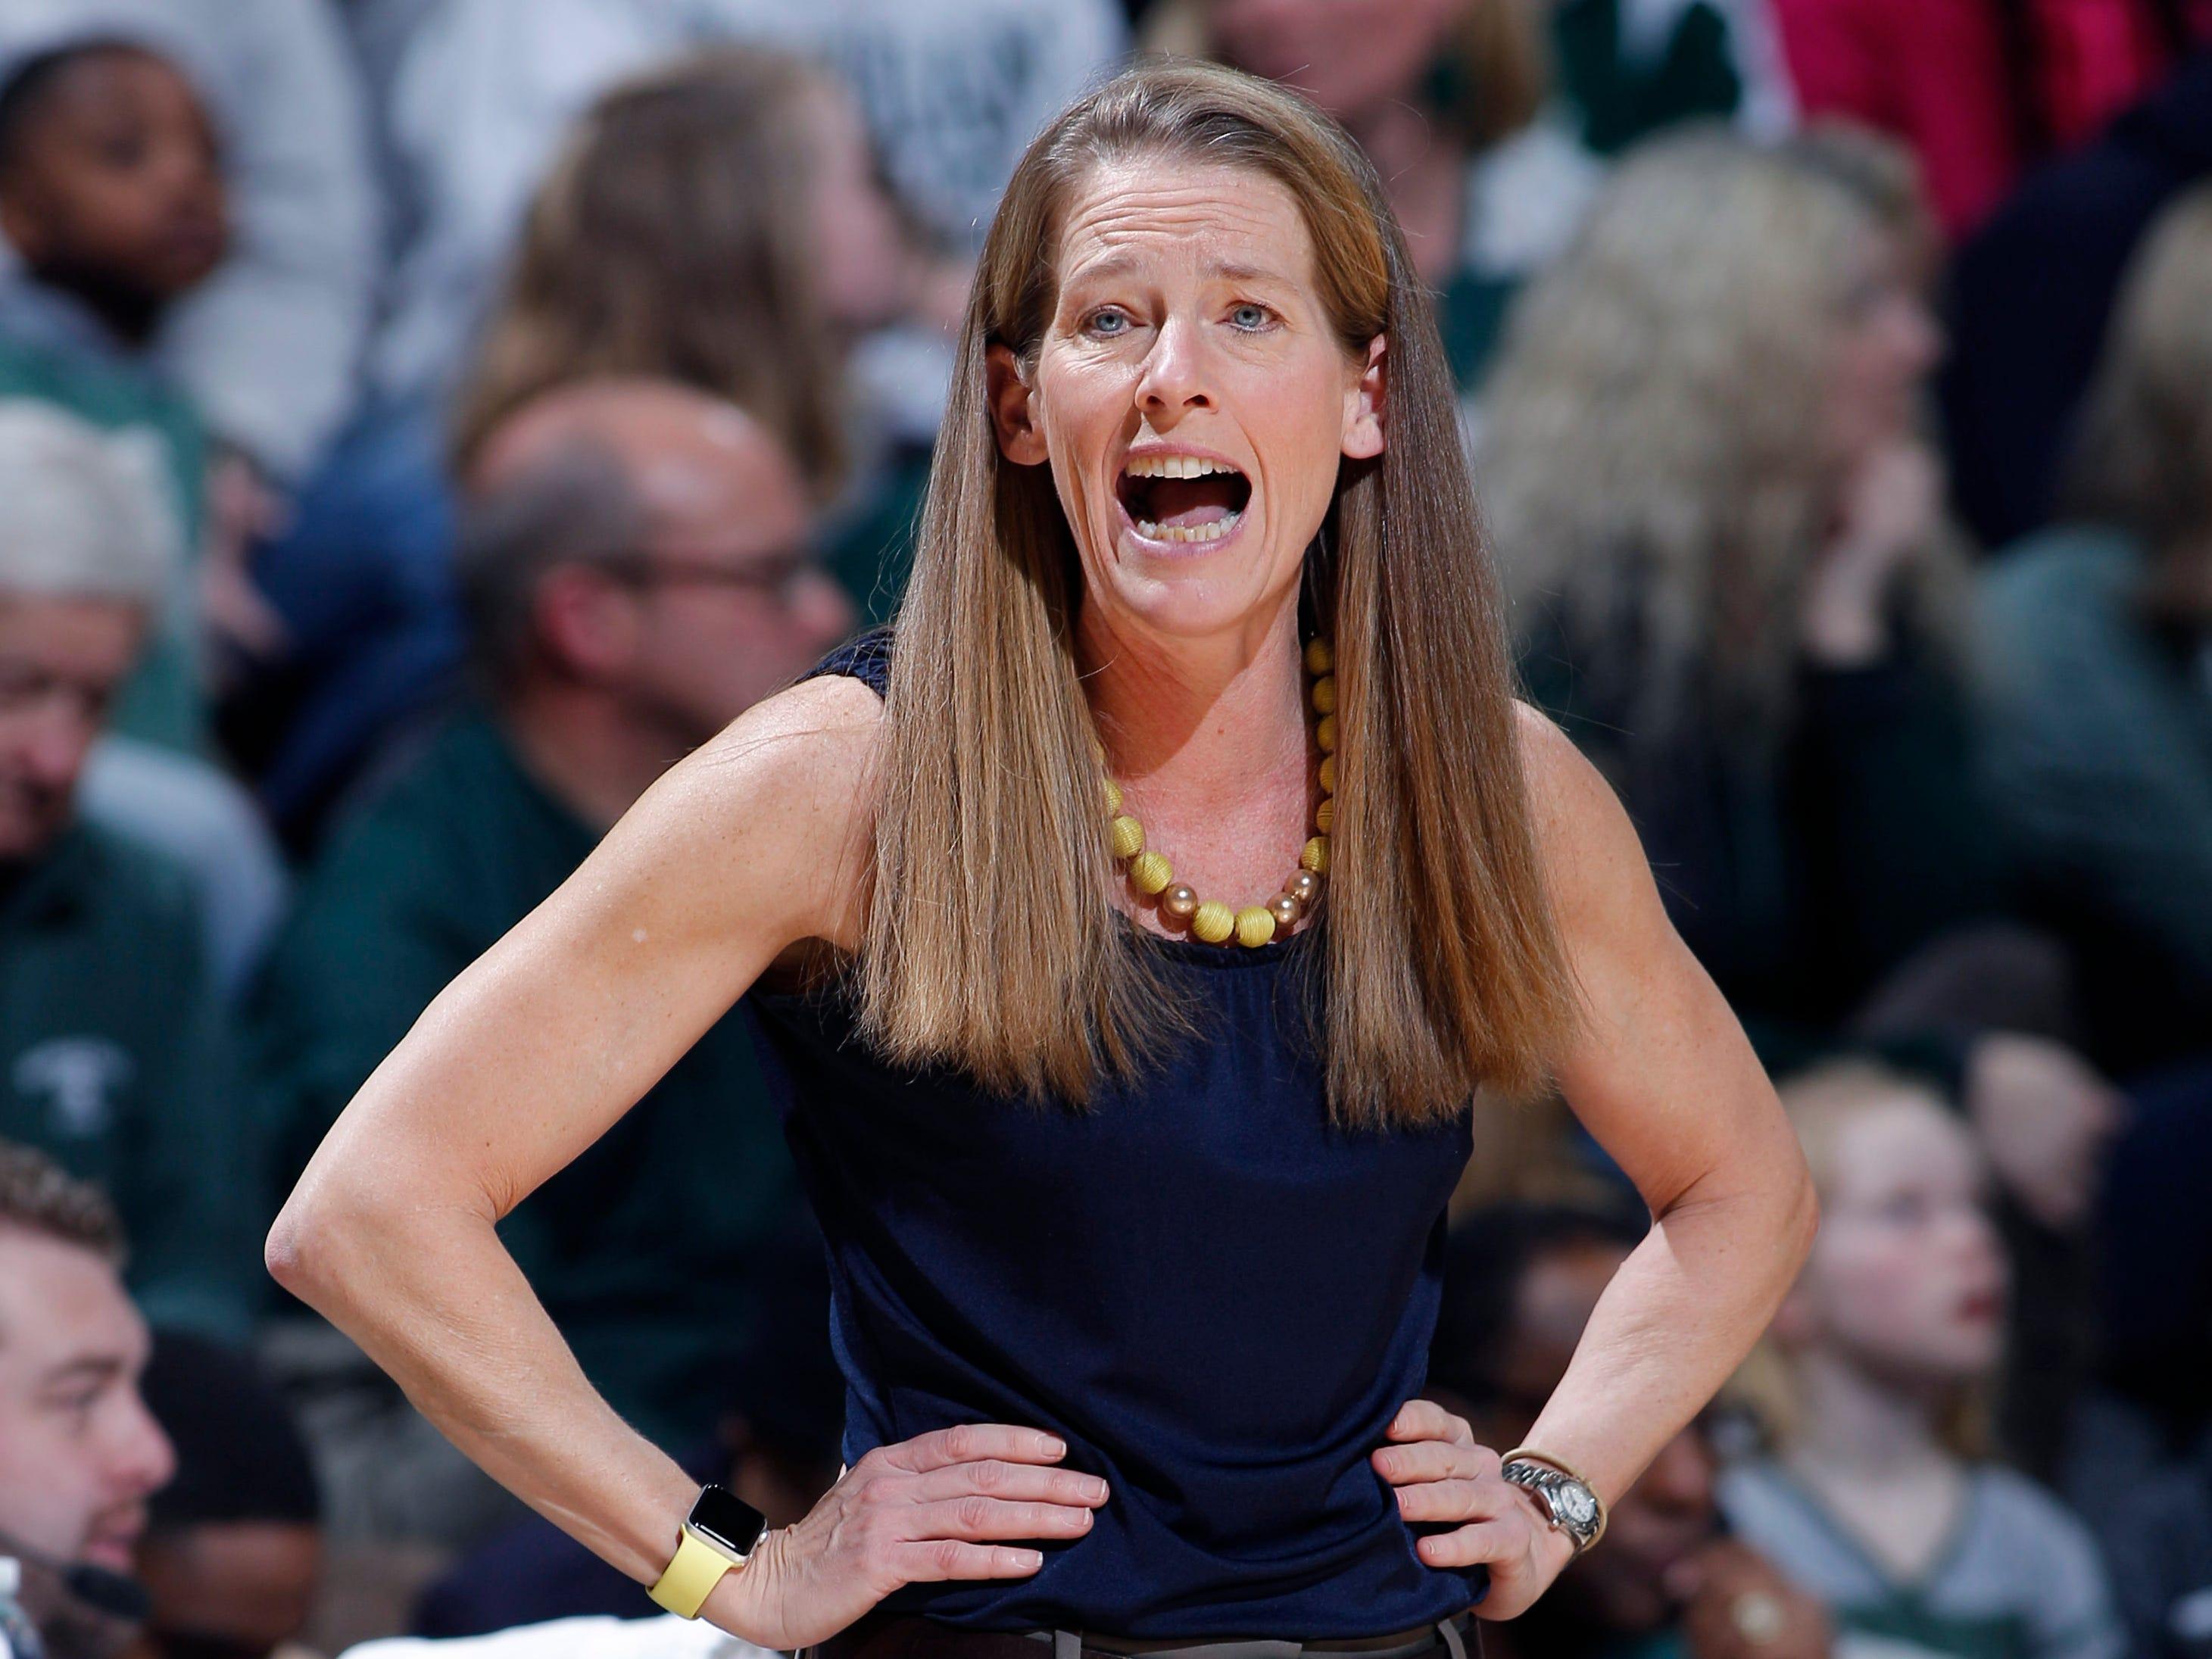 Michigan coach Kim Barnes Arico shouts from the Michigan bench.